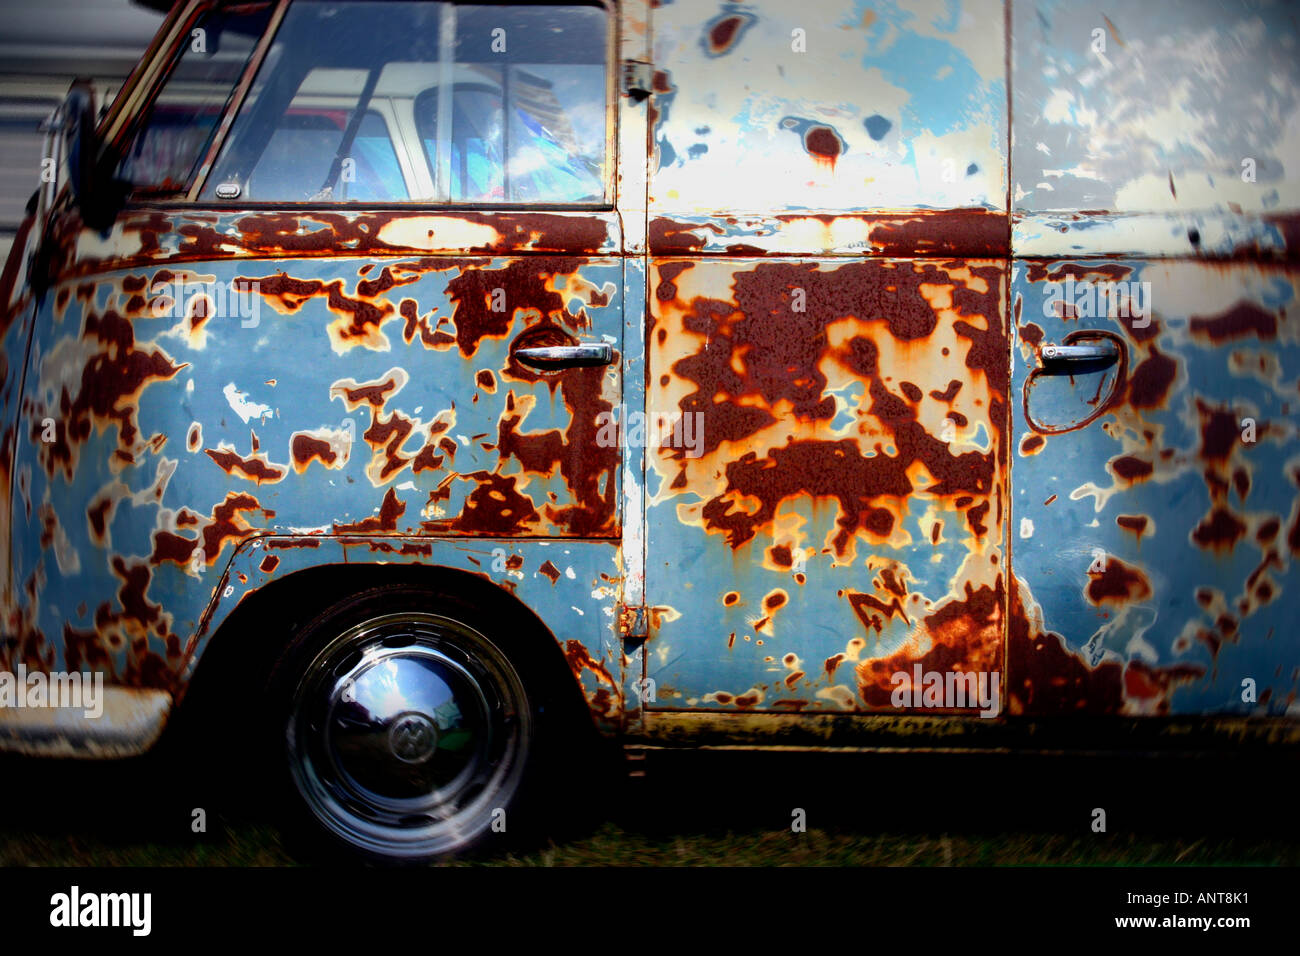 old rusty VW van - Stock Image